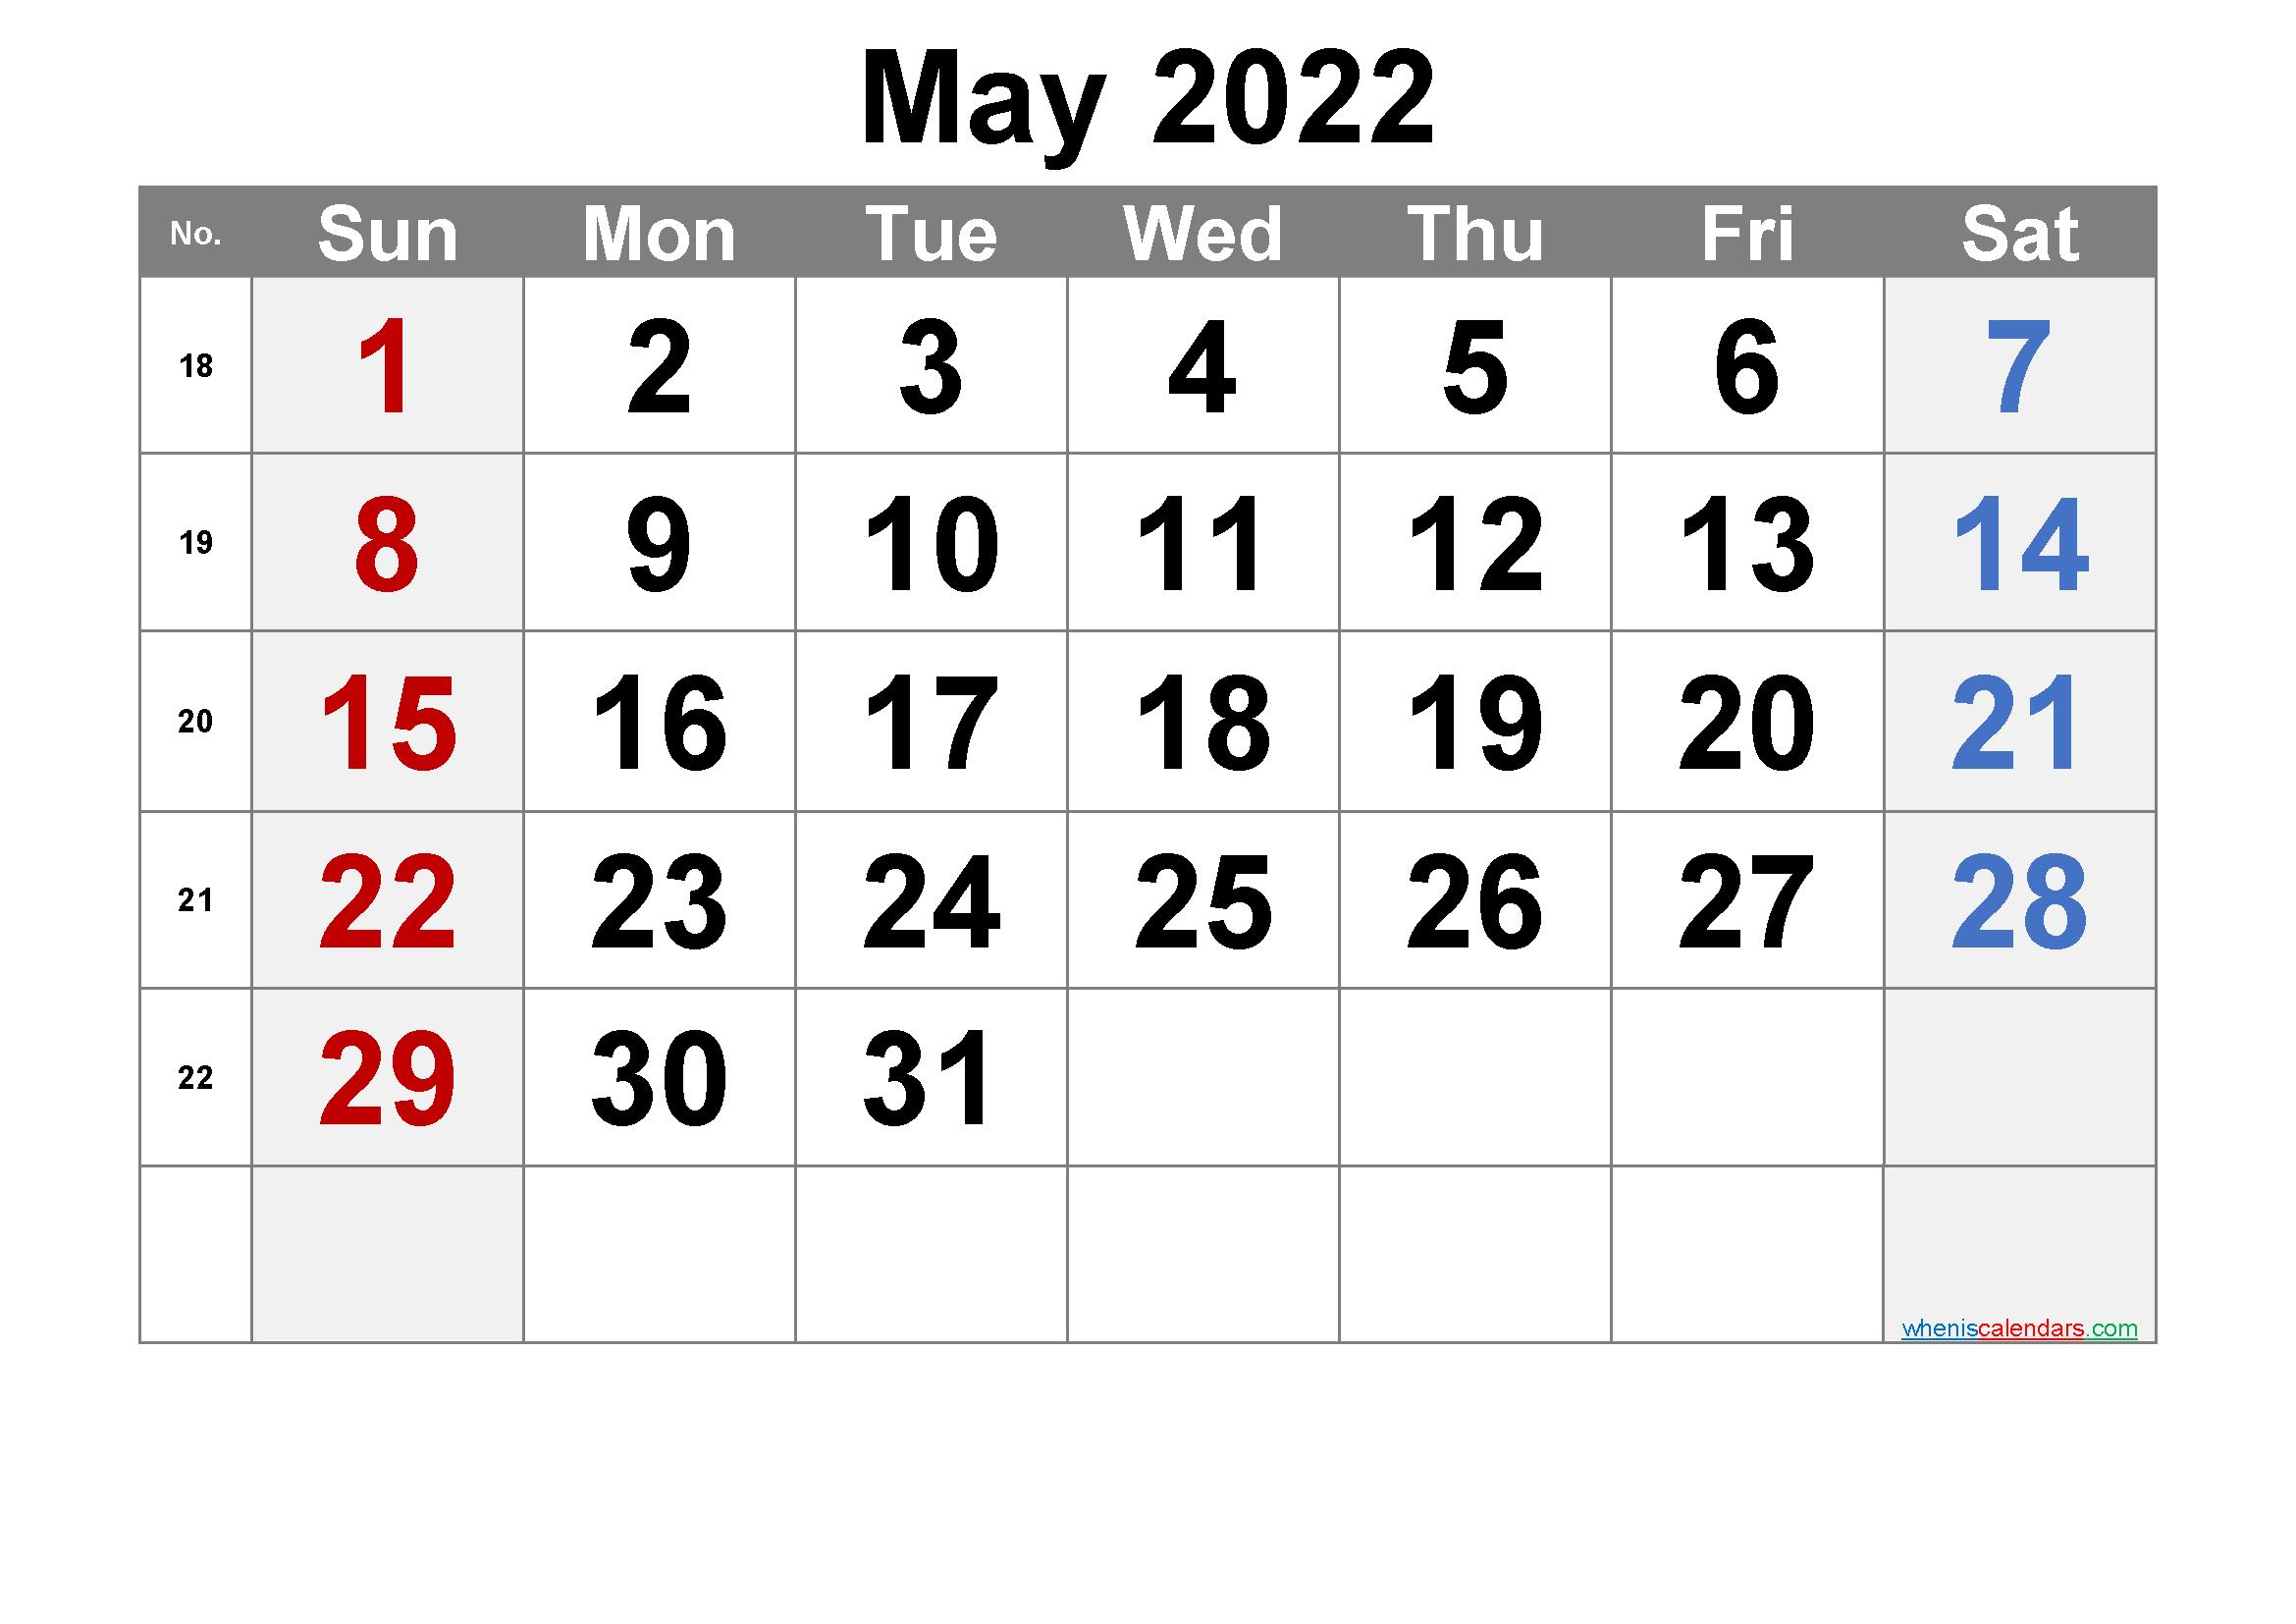 Free May 2022 Calendar with Week Numbers